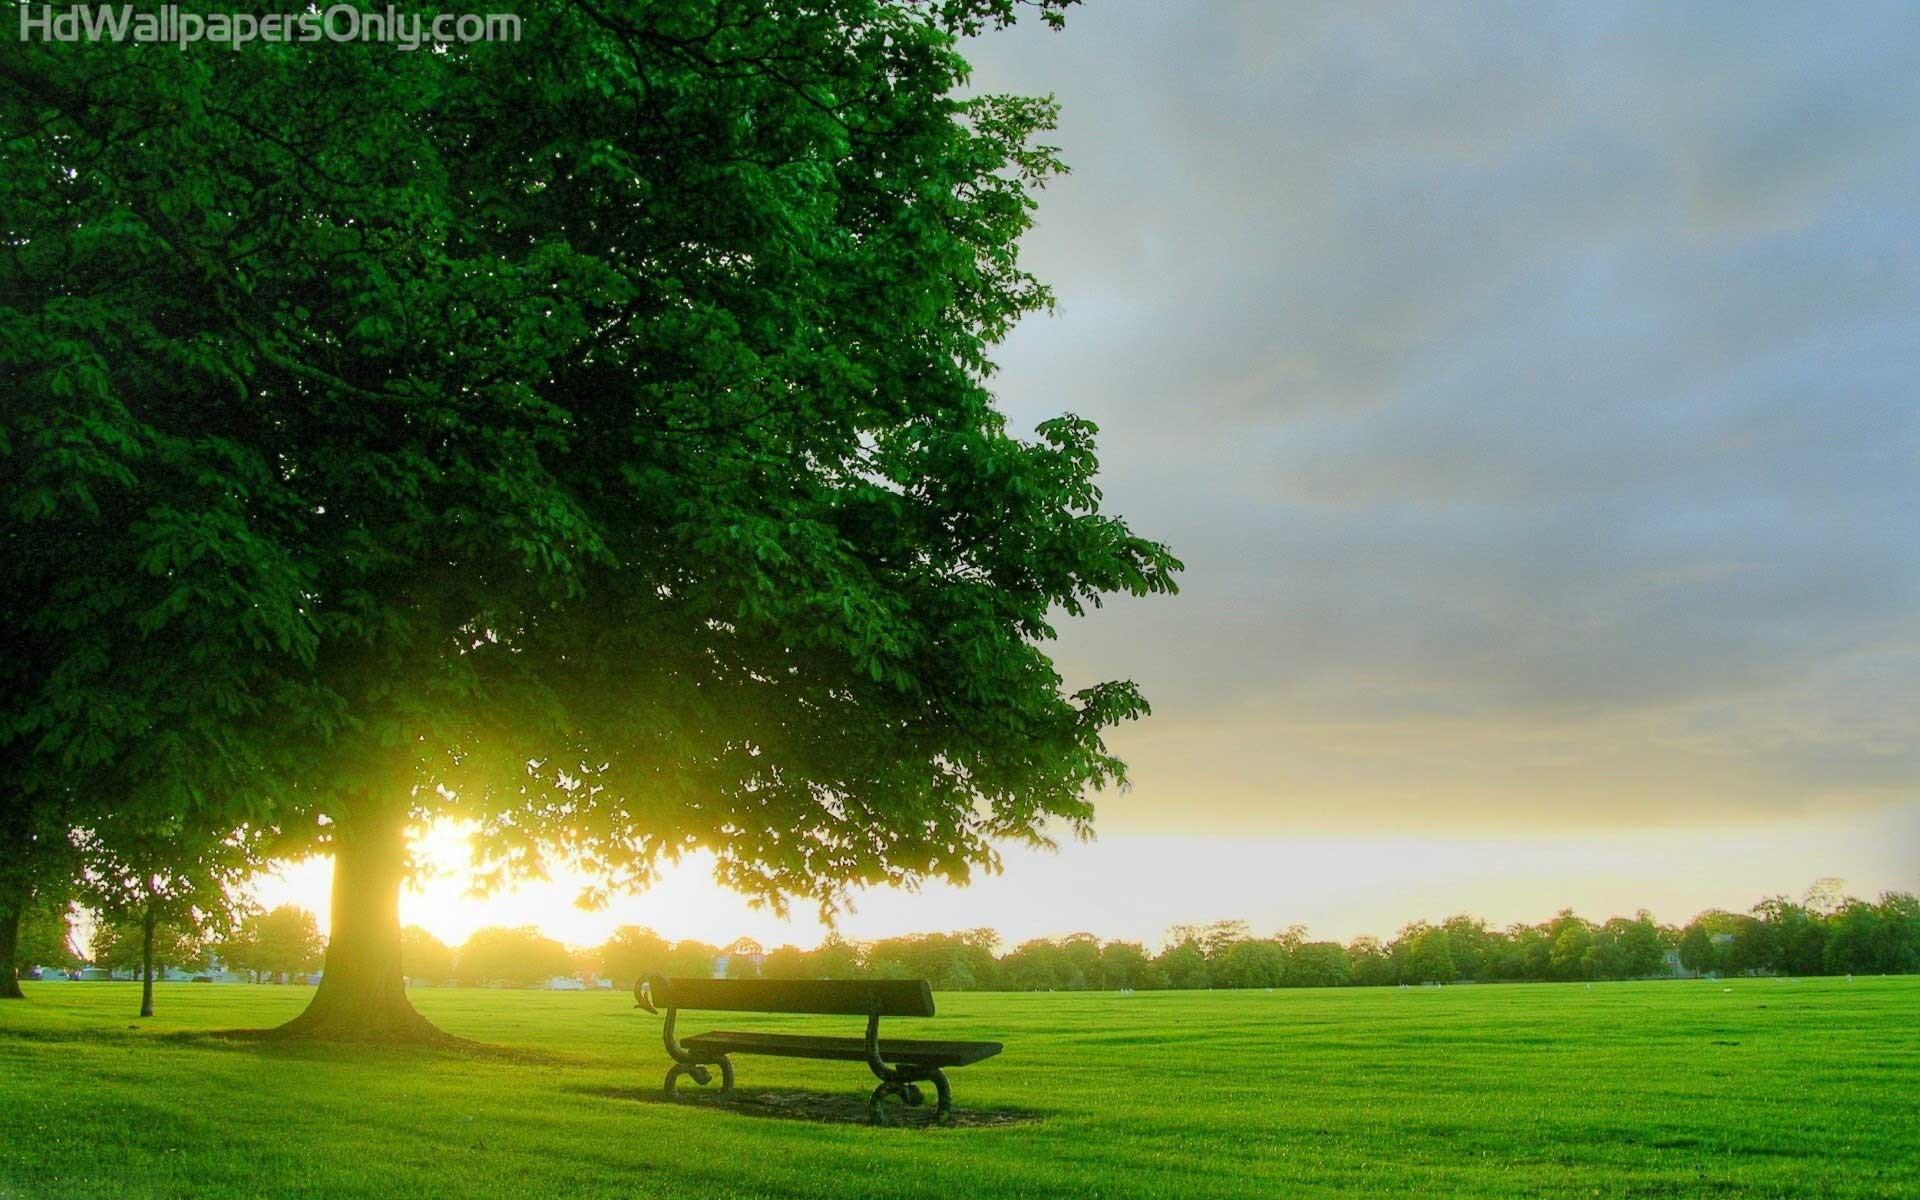 Morning Flowers Beautiful Sunrise Wallpaper HD Download